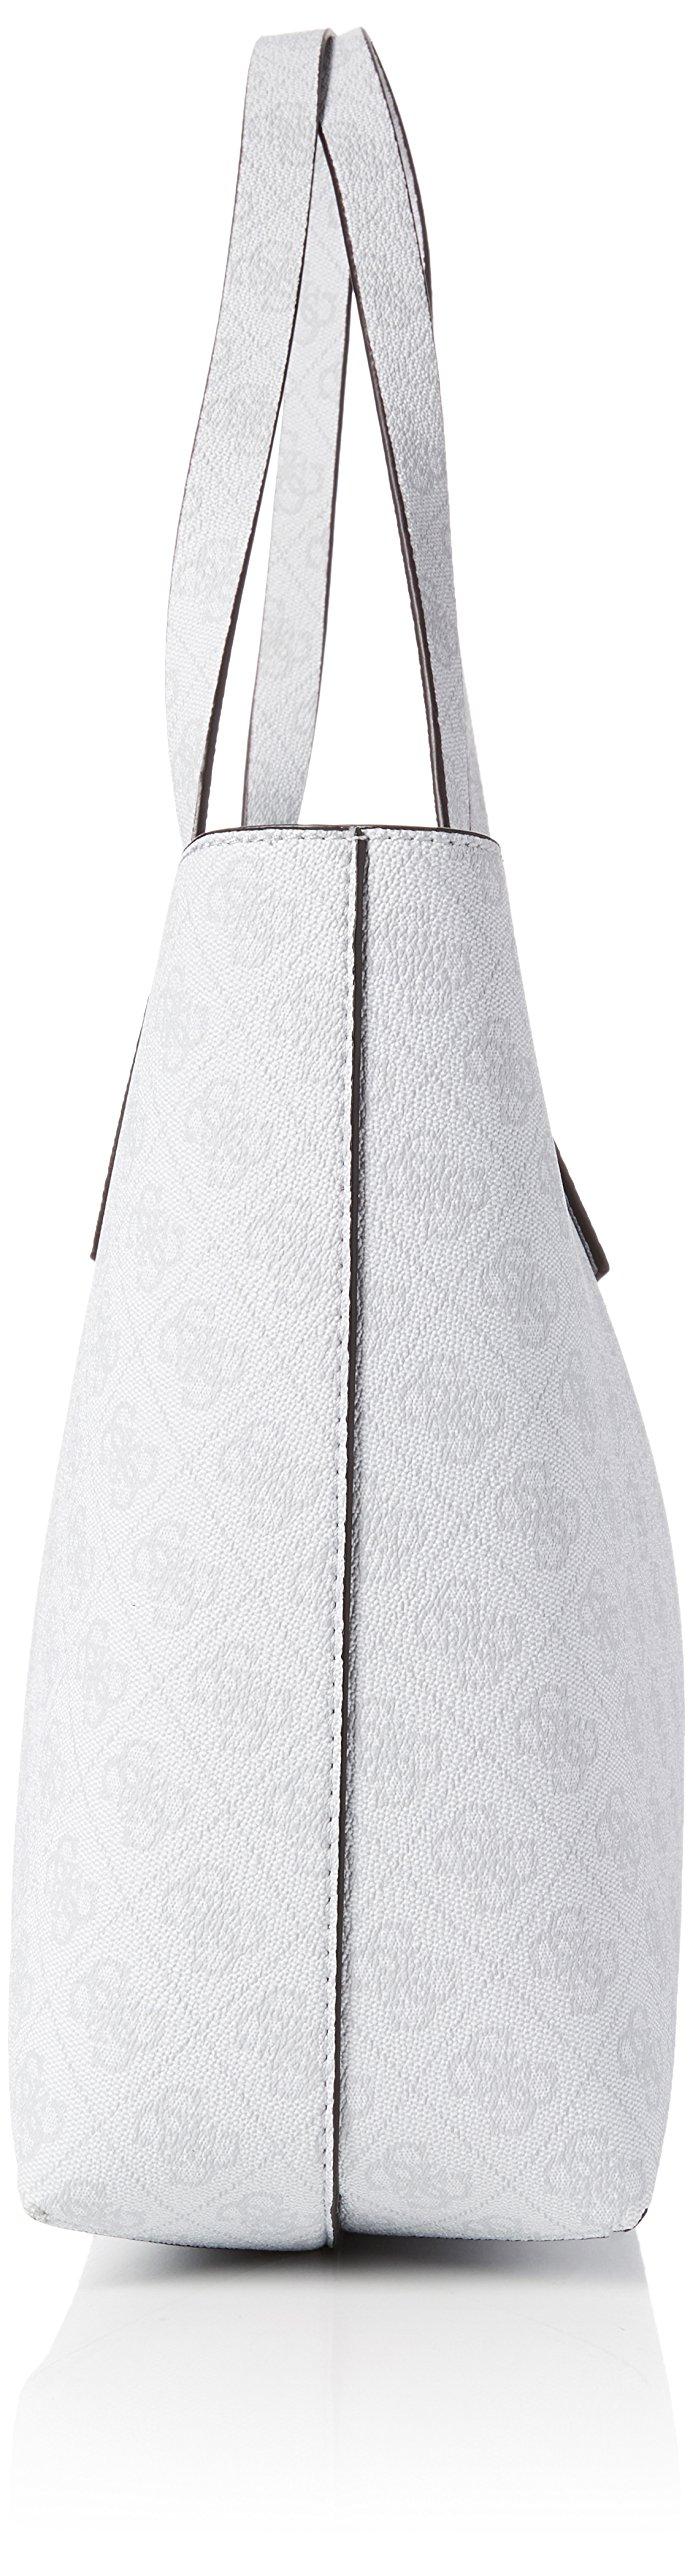 Guess Hwel6422150, Borsa a Mano Donna, Argento (Ice Silver), 12.5x27x42.5 cm (W x H x L) FACESHOPPING